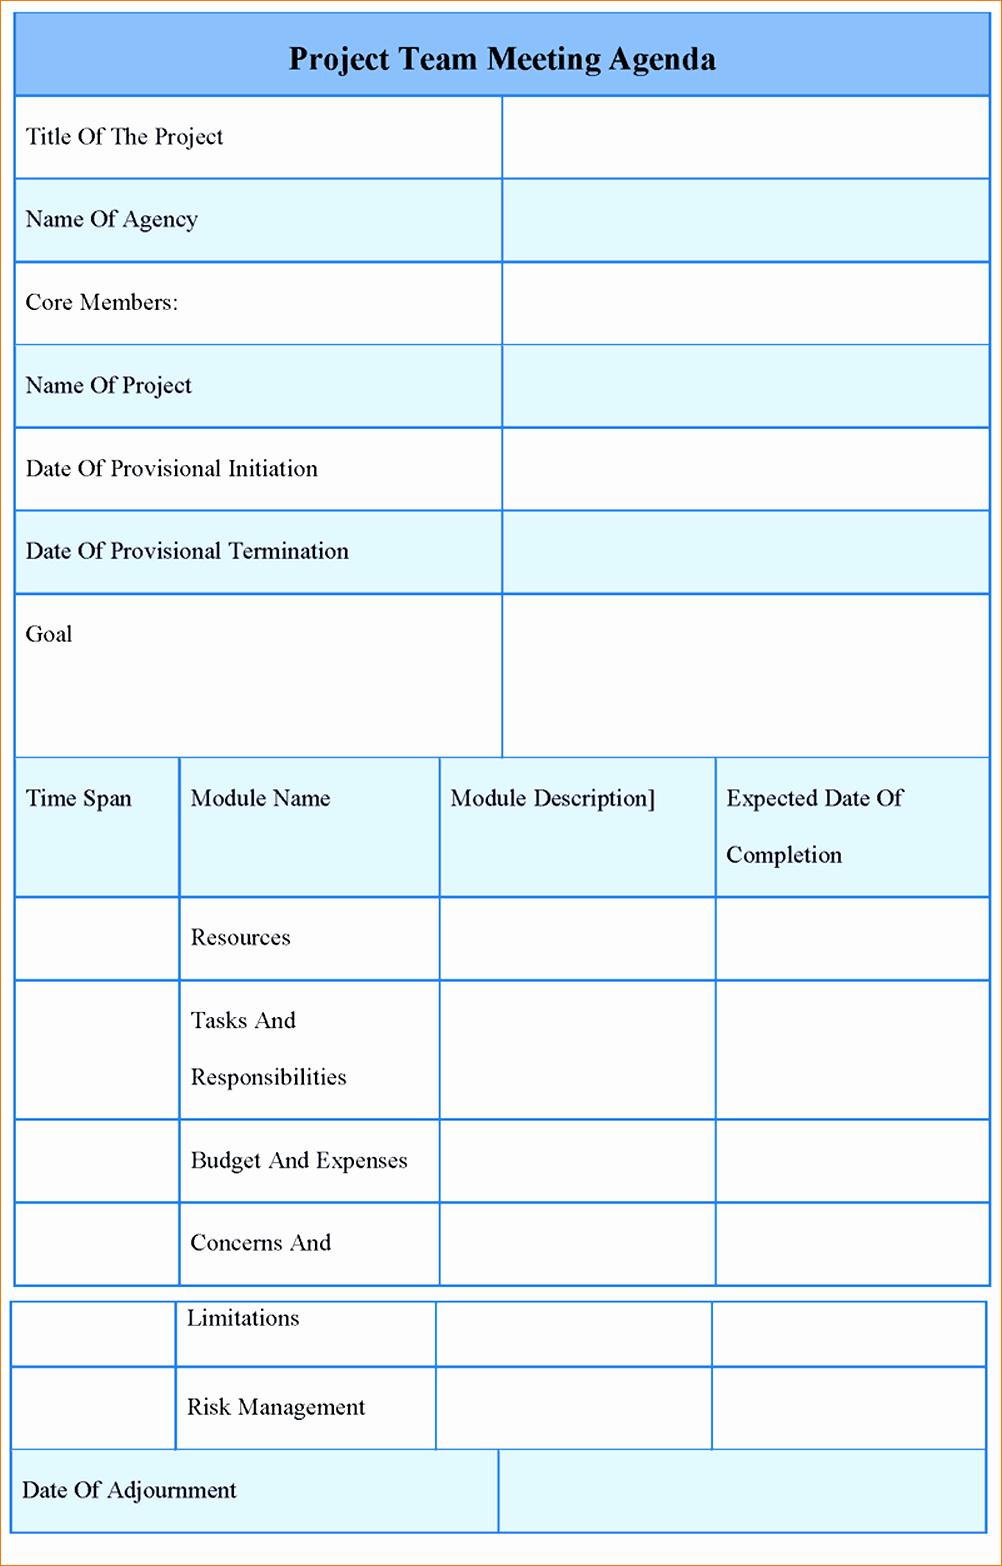 Microsoft Business Plan Template New Meeting Agenda format Radioberacahgeorgia